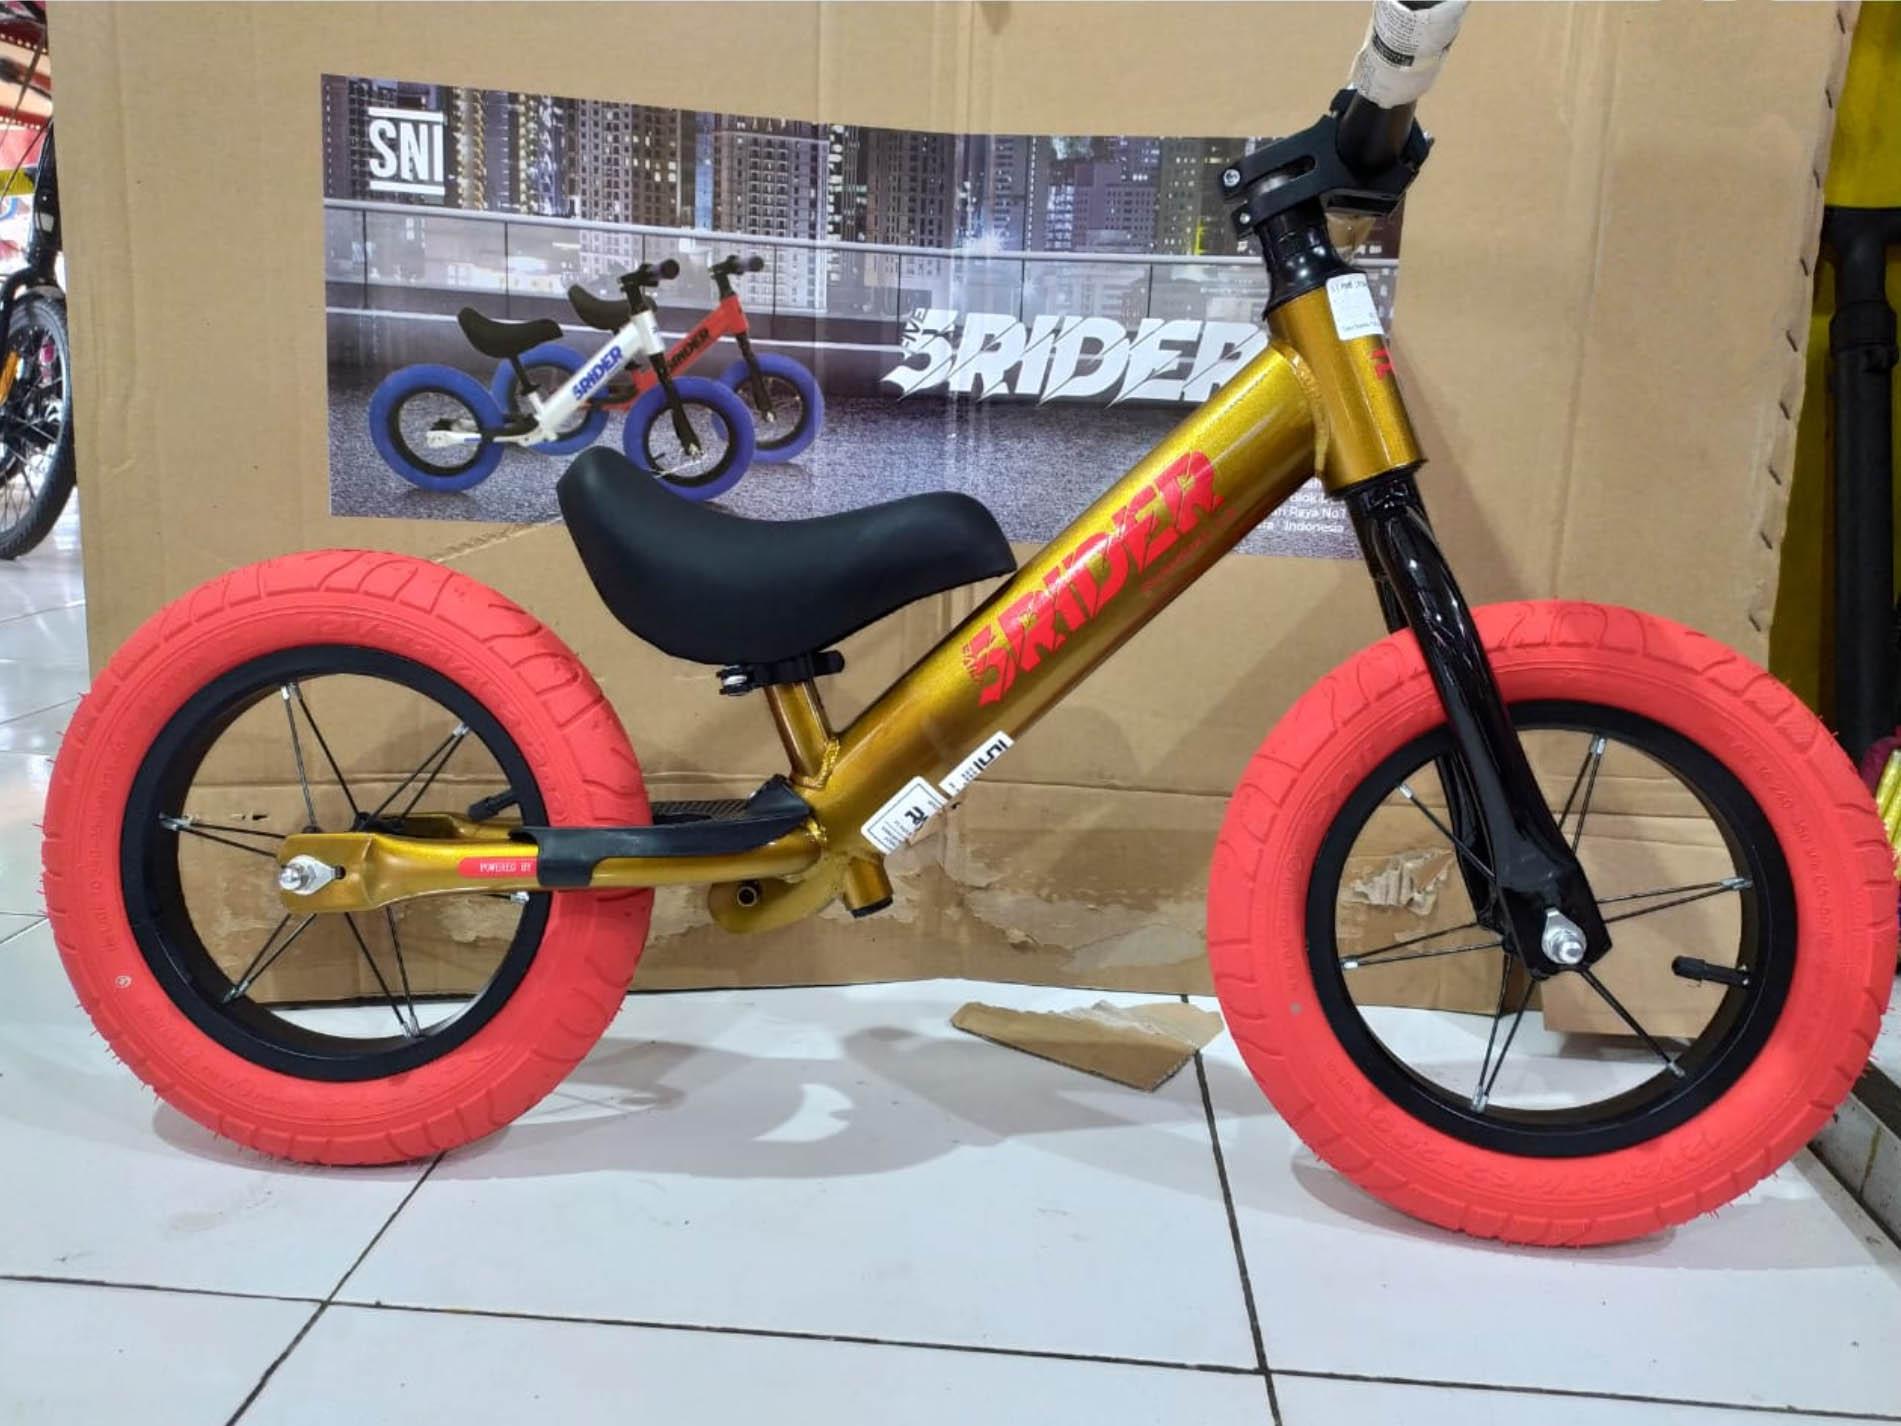 Jual Sepeda Brand Terbaik Harga Promo | Lazada.co.id